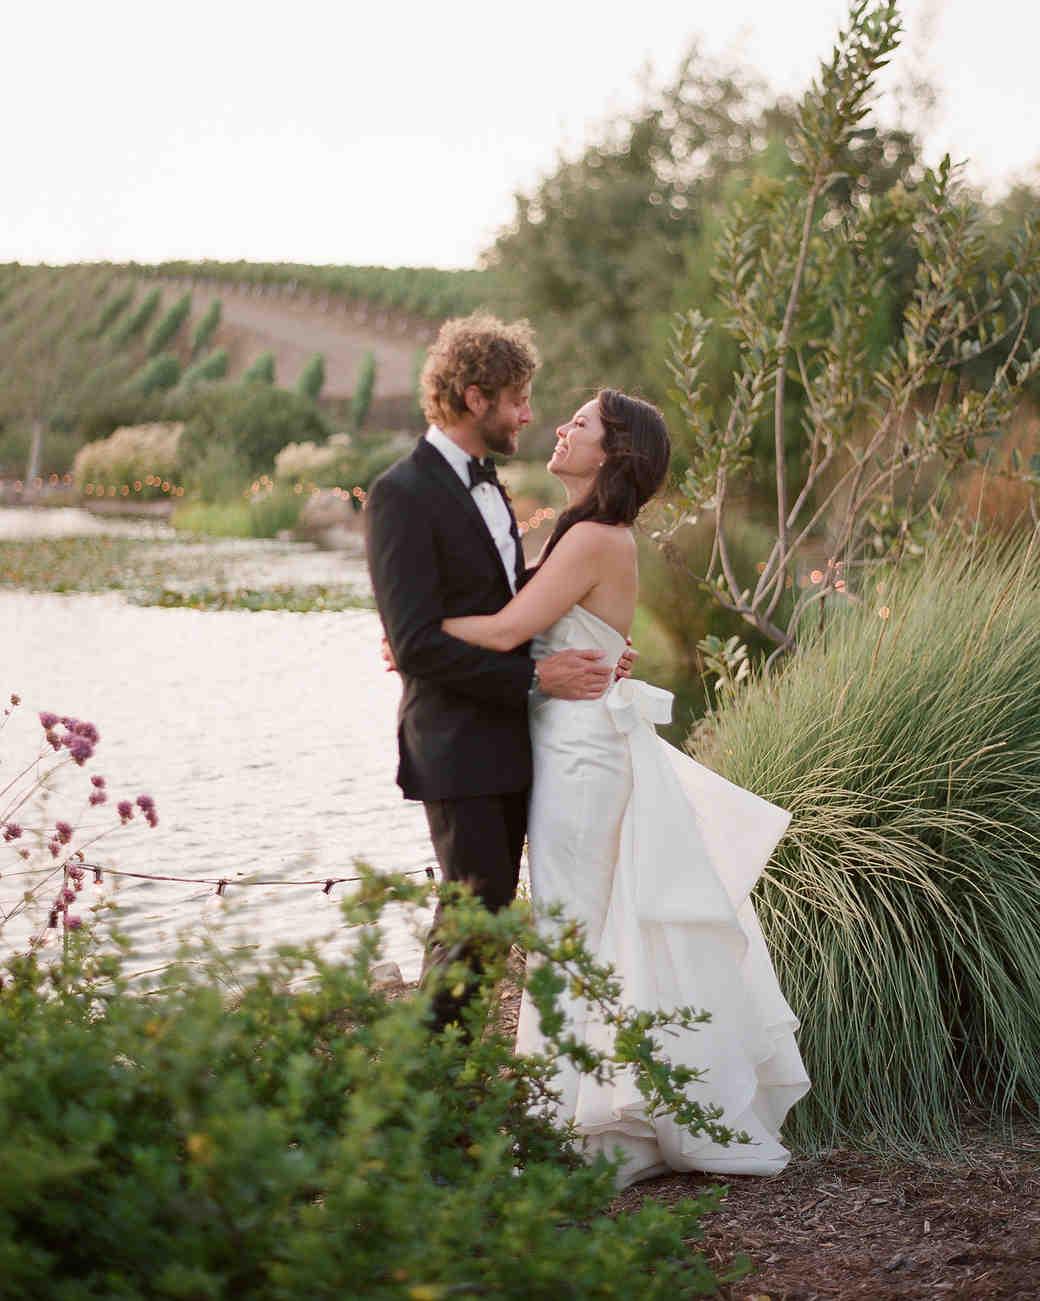 corrine-patrick-wedding-santa-ynez-44340005-s110842-0215.jpg